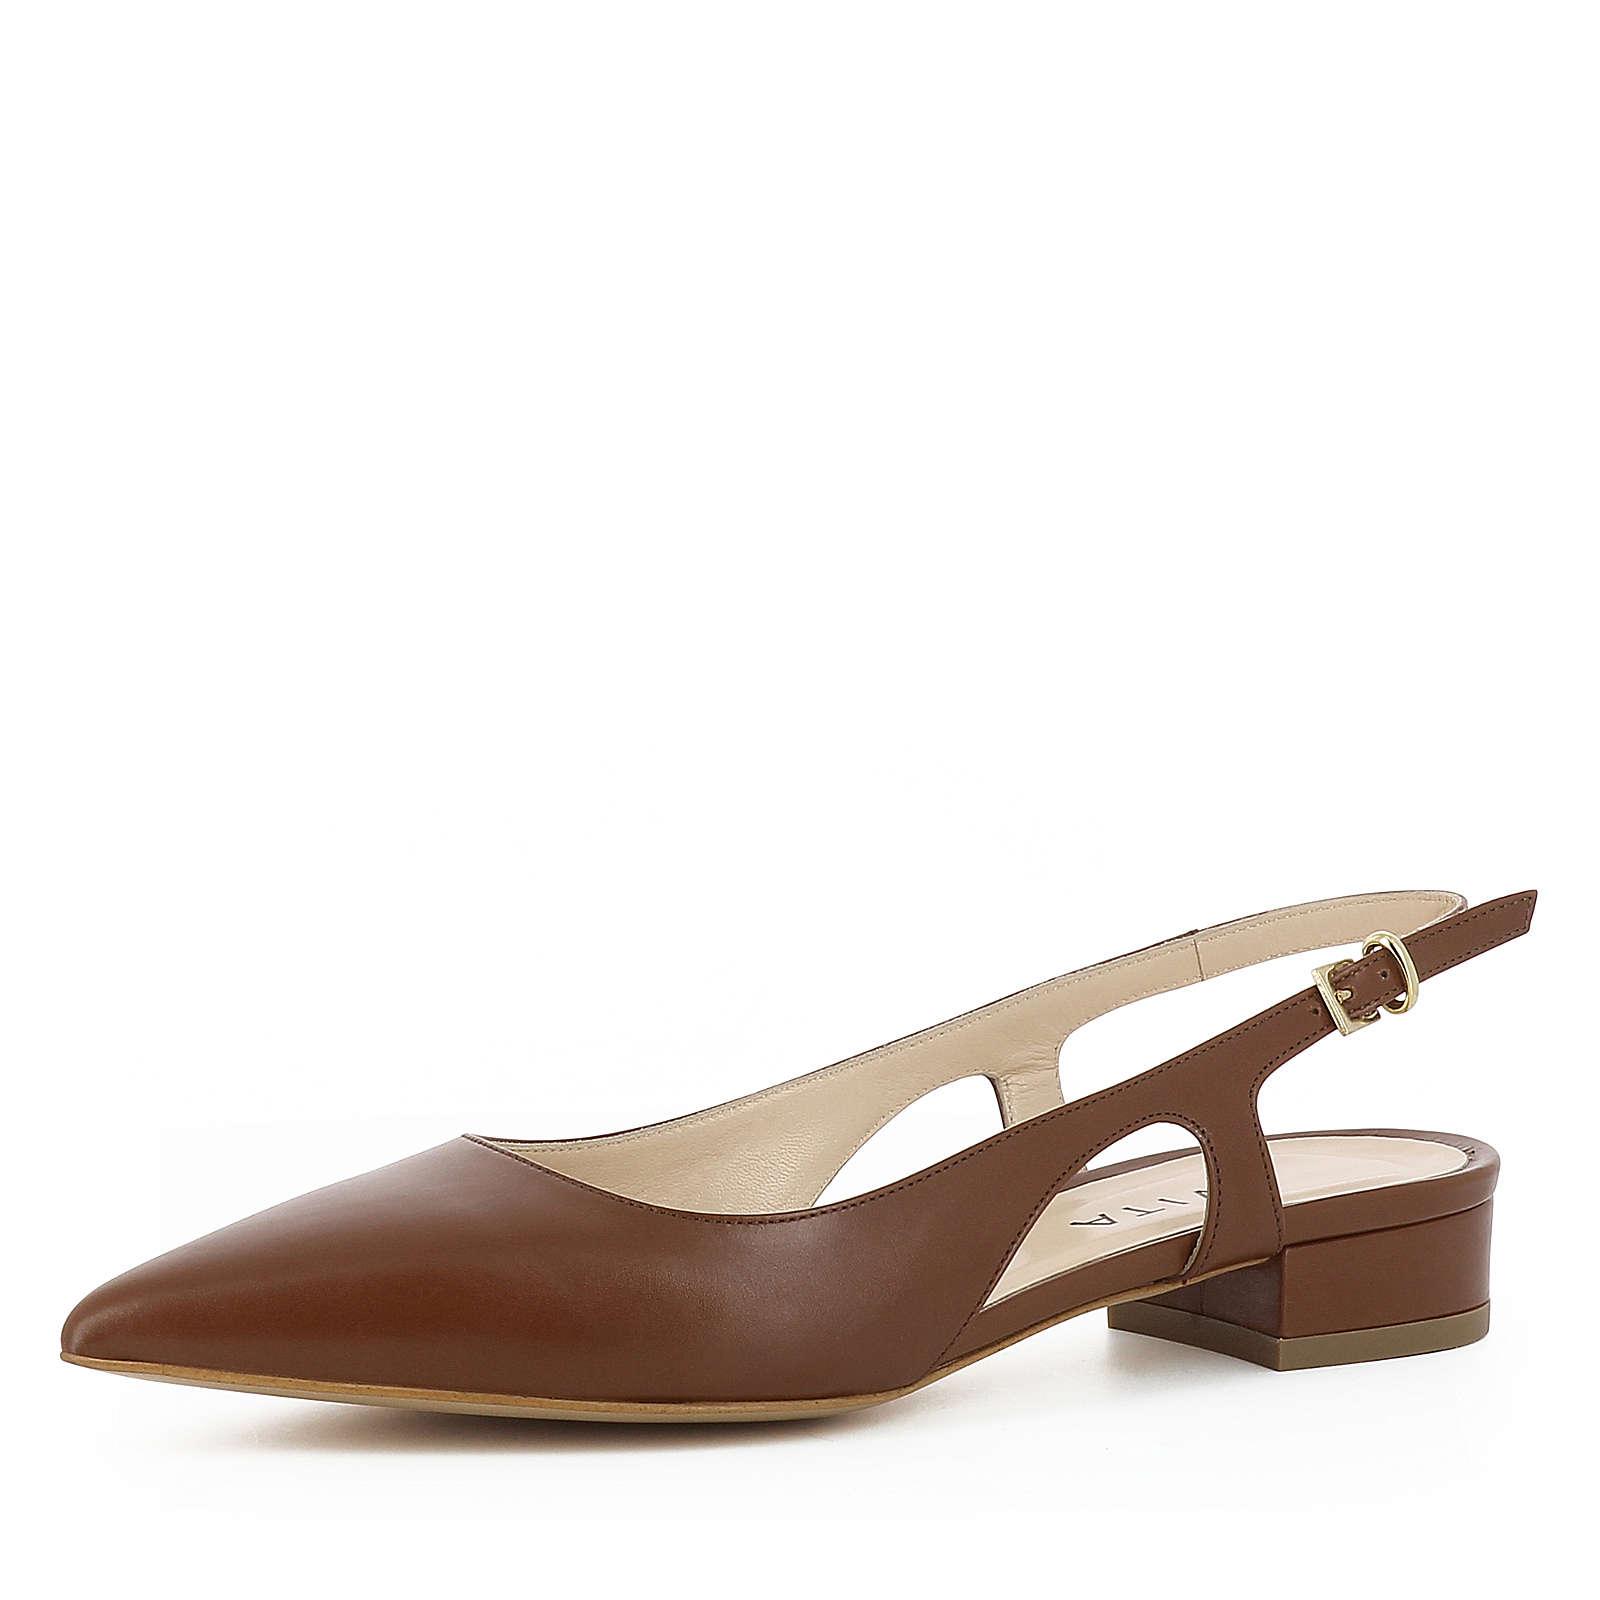 Evita Shoes FRANCA Sling-Pumps braun Damen Gr. 38